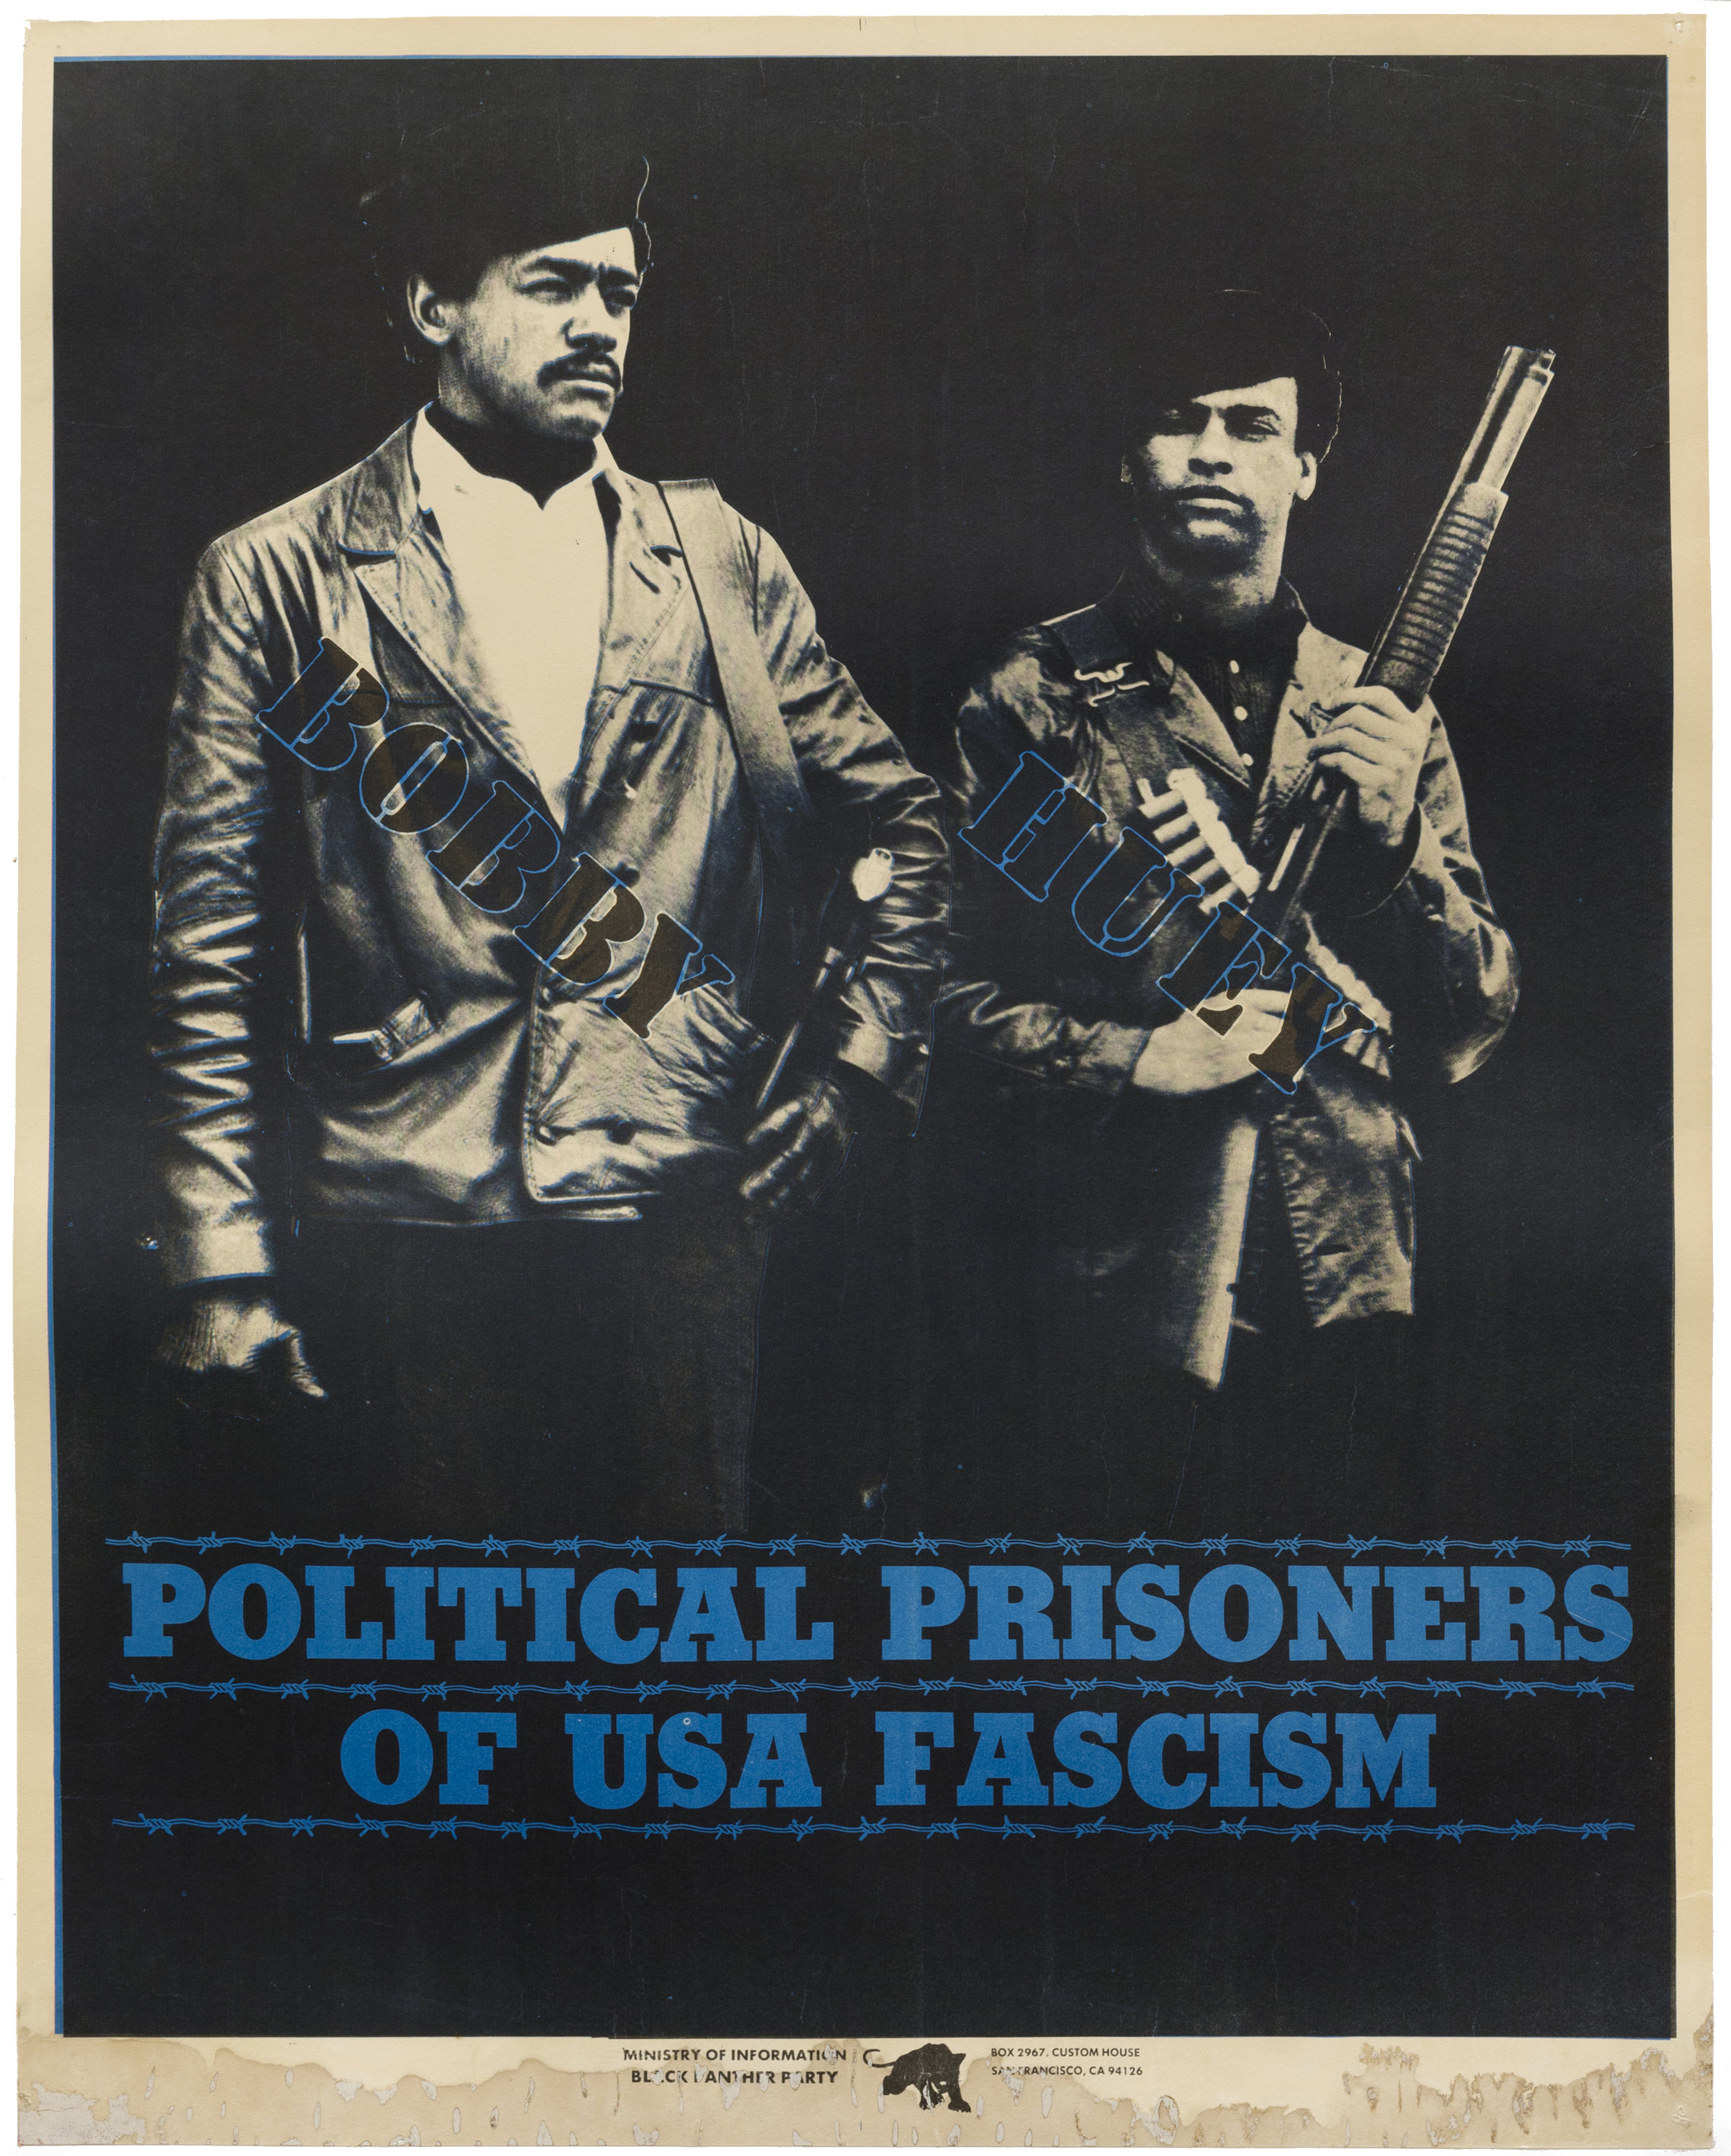 mima_get up stand up_black panthers_POLITICAL PRISONERS OF USA FASCISM.jpg